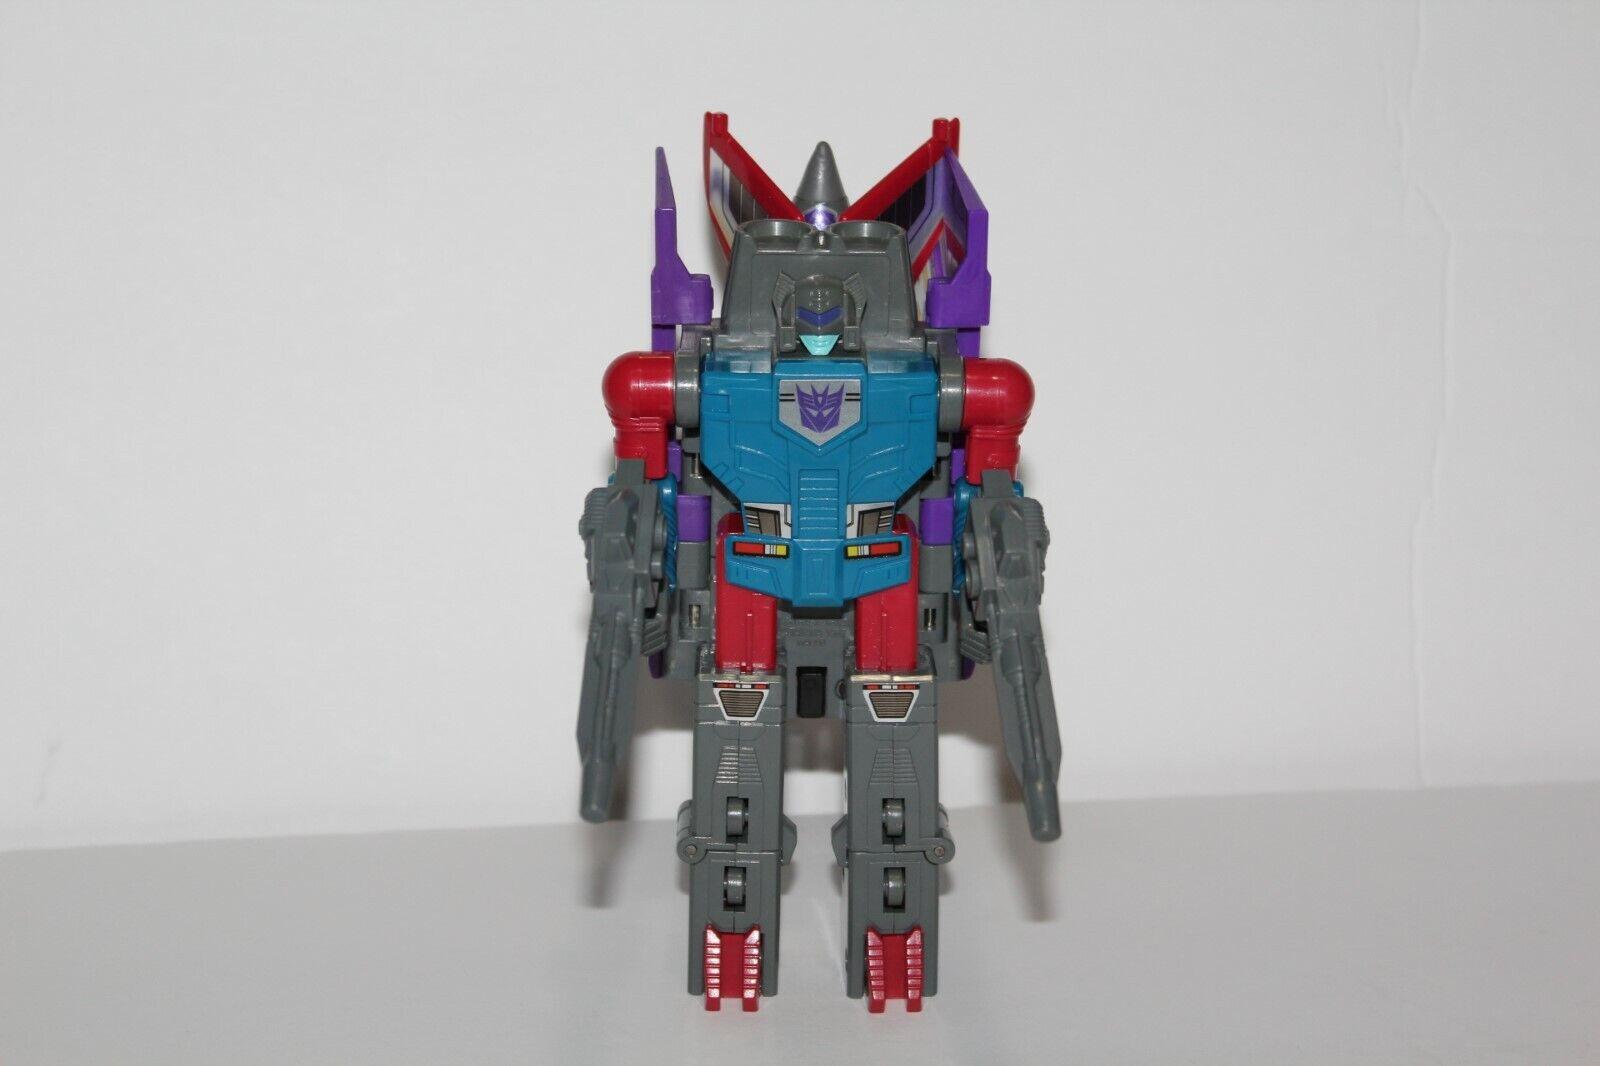 Transformers G1 Hydra Masterforce Powermaster Jahr Japan Takara Victory Zone